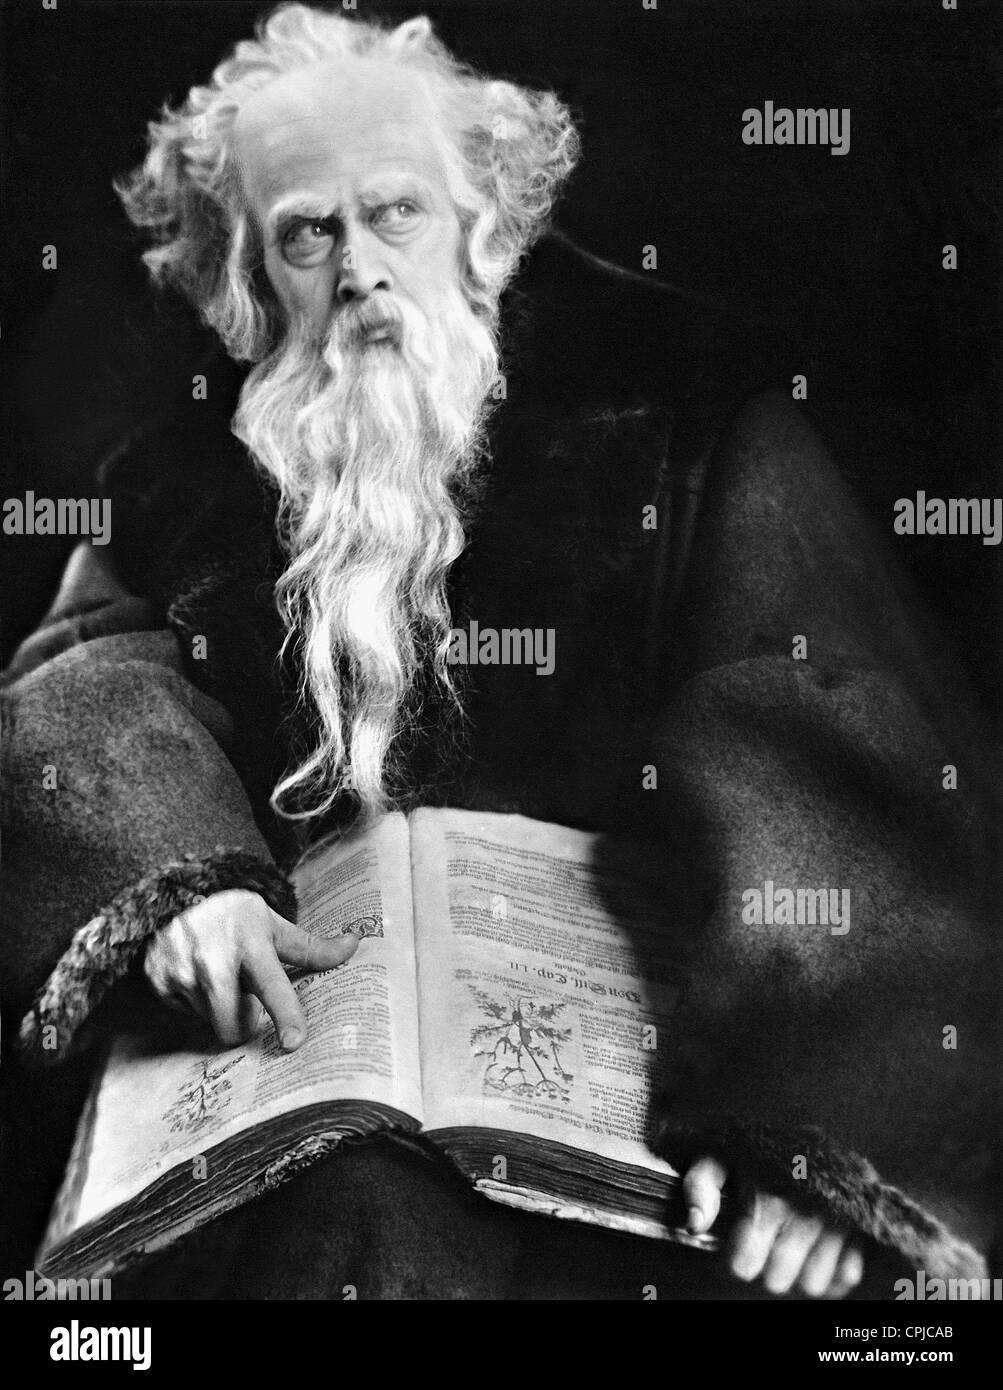 Goesta Ekman in 'Faust', 1926 - Stock Image